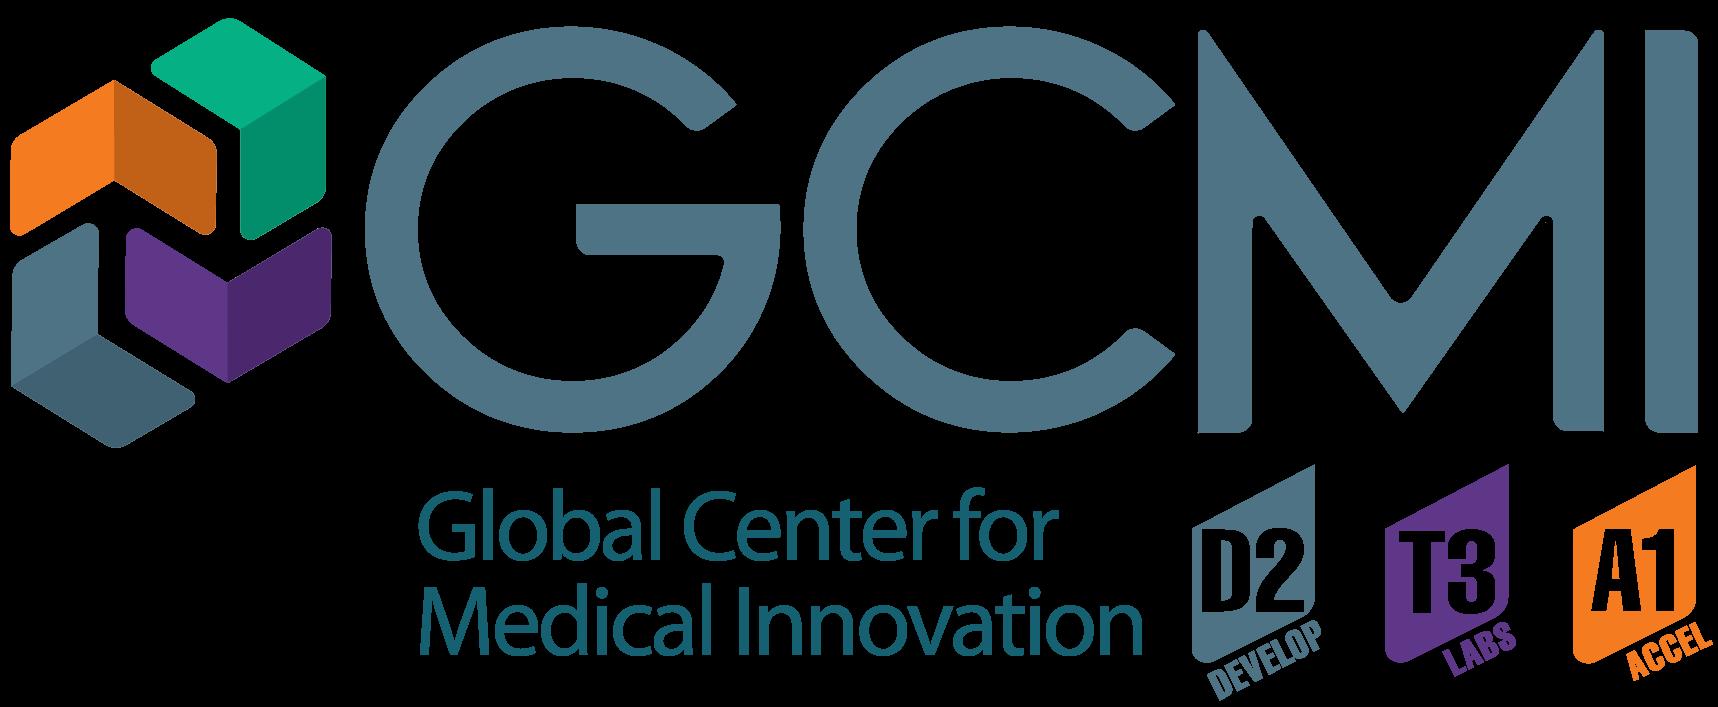 GCMI-logo-new